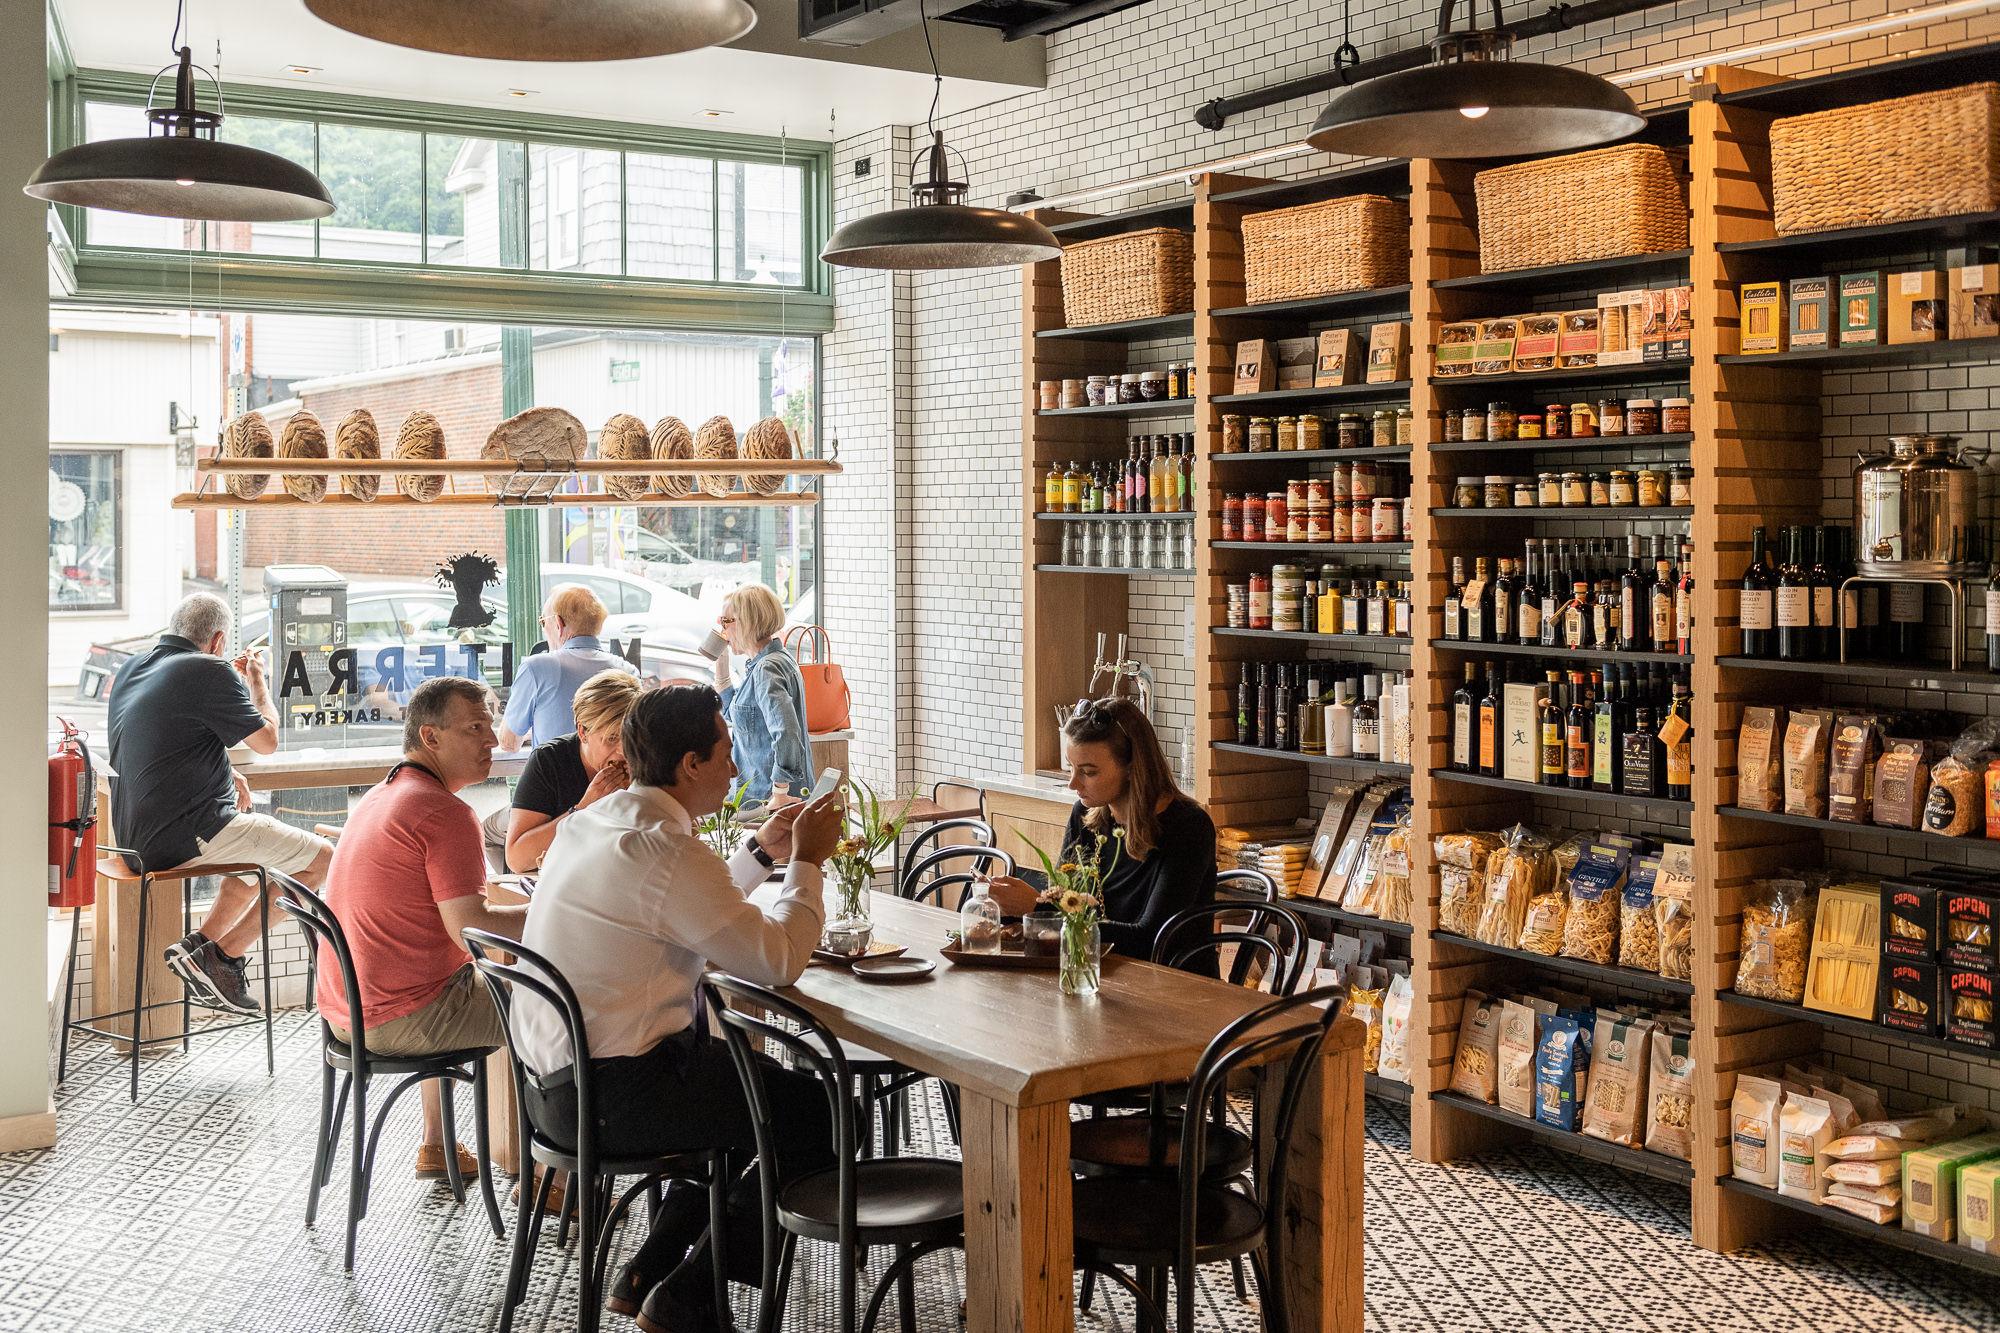 The Gluten-Free Grains Cookbook Event: Private Dinner at Mediterra Café